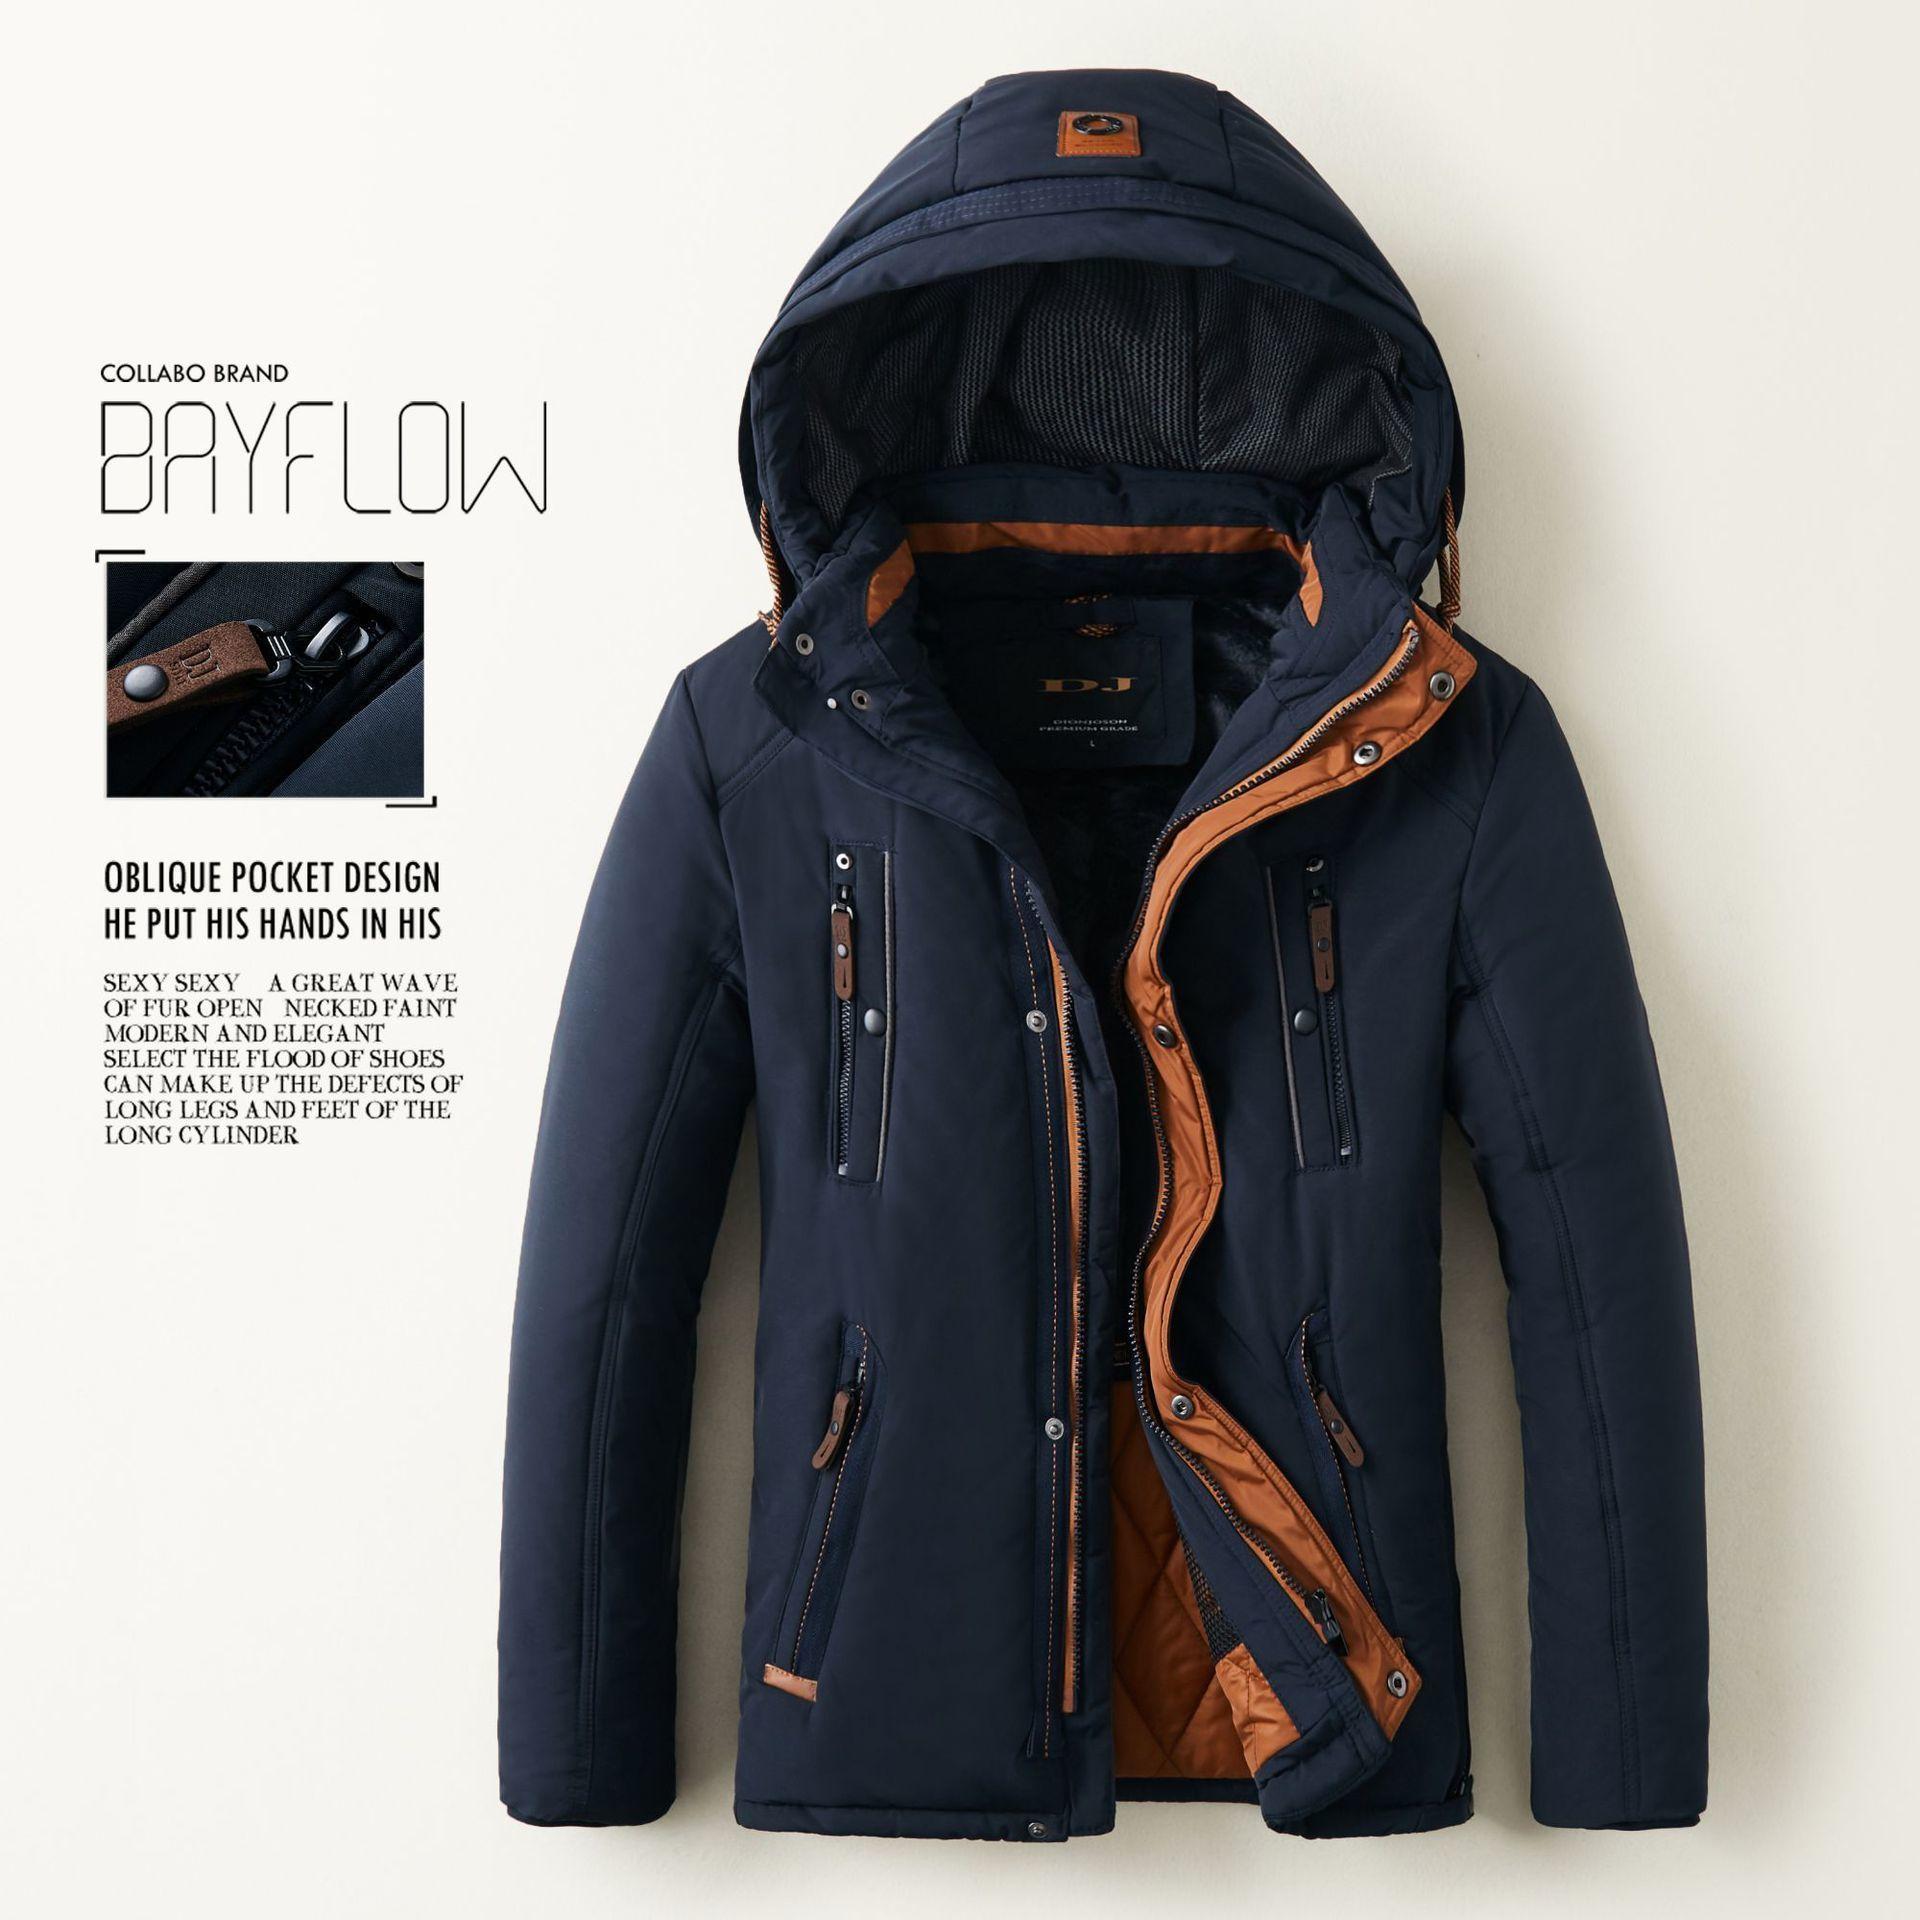 595cf7217bd7d3 Parka Leather Varsity Mens Jackets Styles For Men Clothes Ma1 Bomber Biker  Cotton Padded Coat Windbreakers Winter Coats Kanye West Hoodie Bomber Jacket  ...